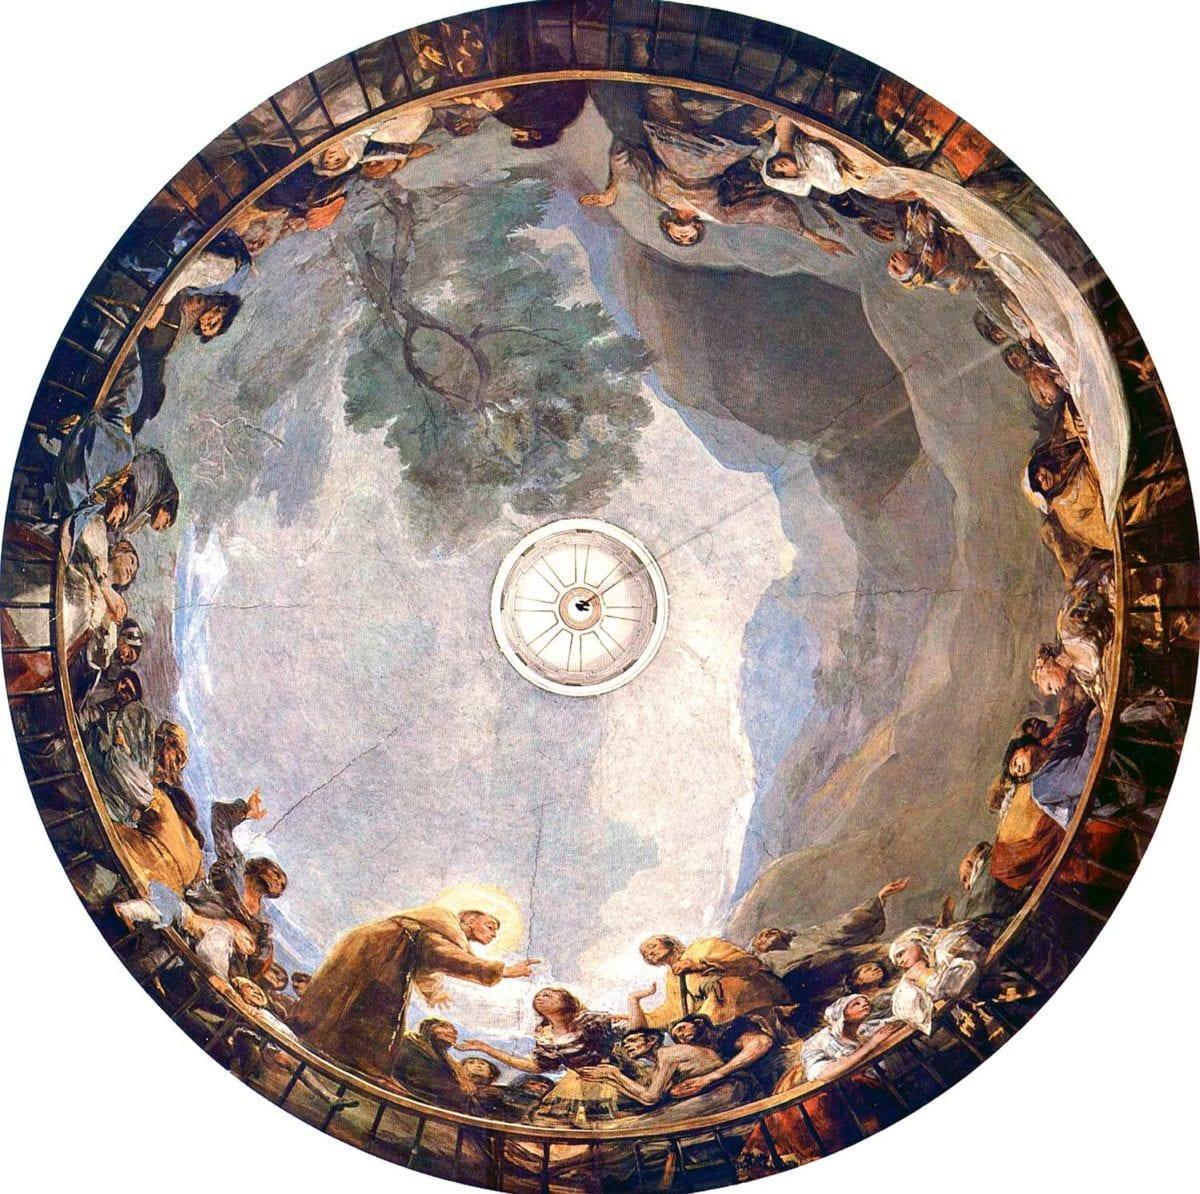 Goya, The Royal Chapel of Saint Anthony of La Florida frescoes, c.1798. Wikimedia Commons.